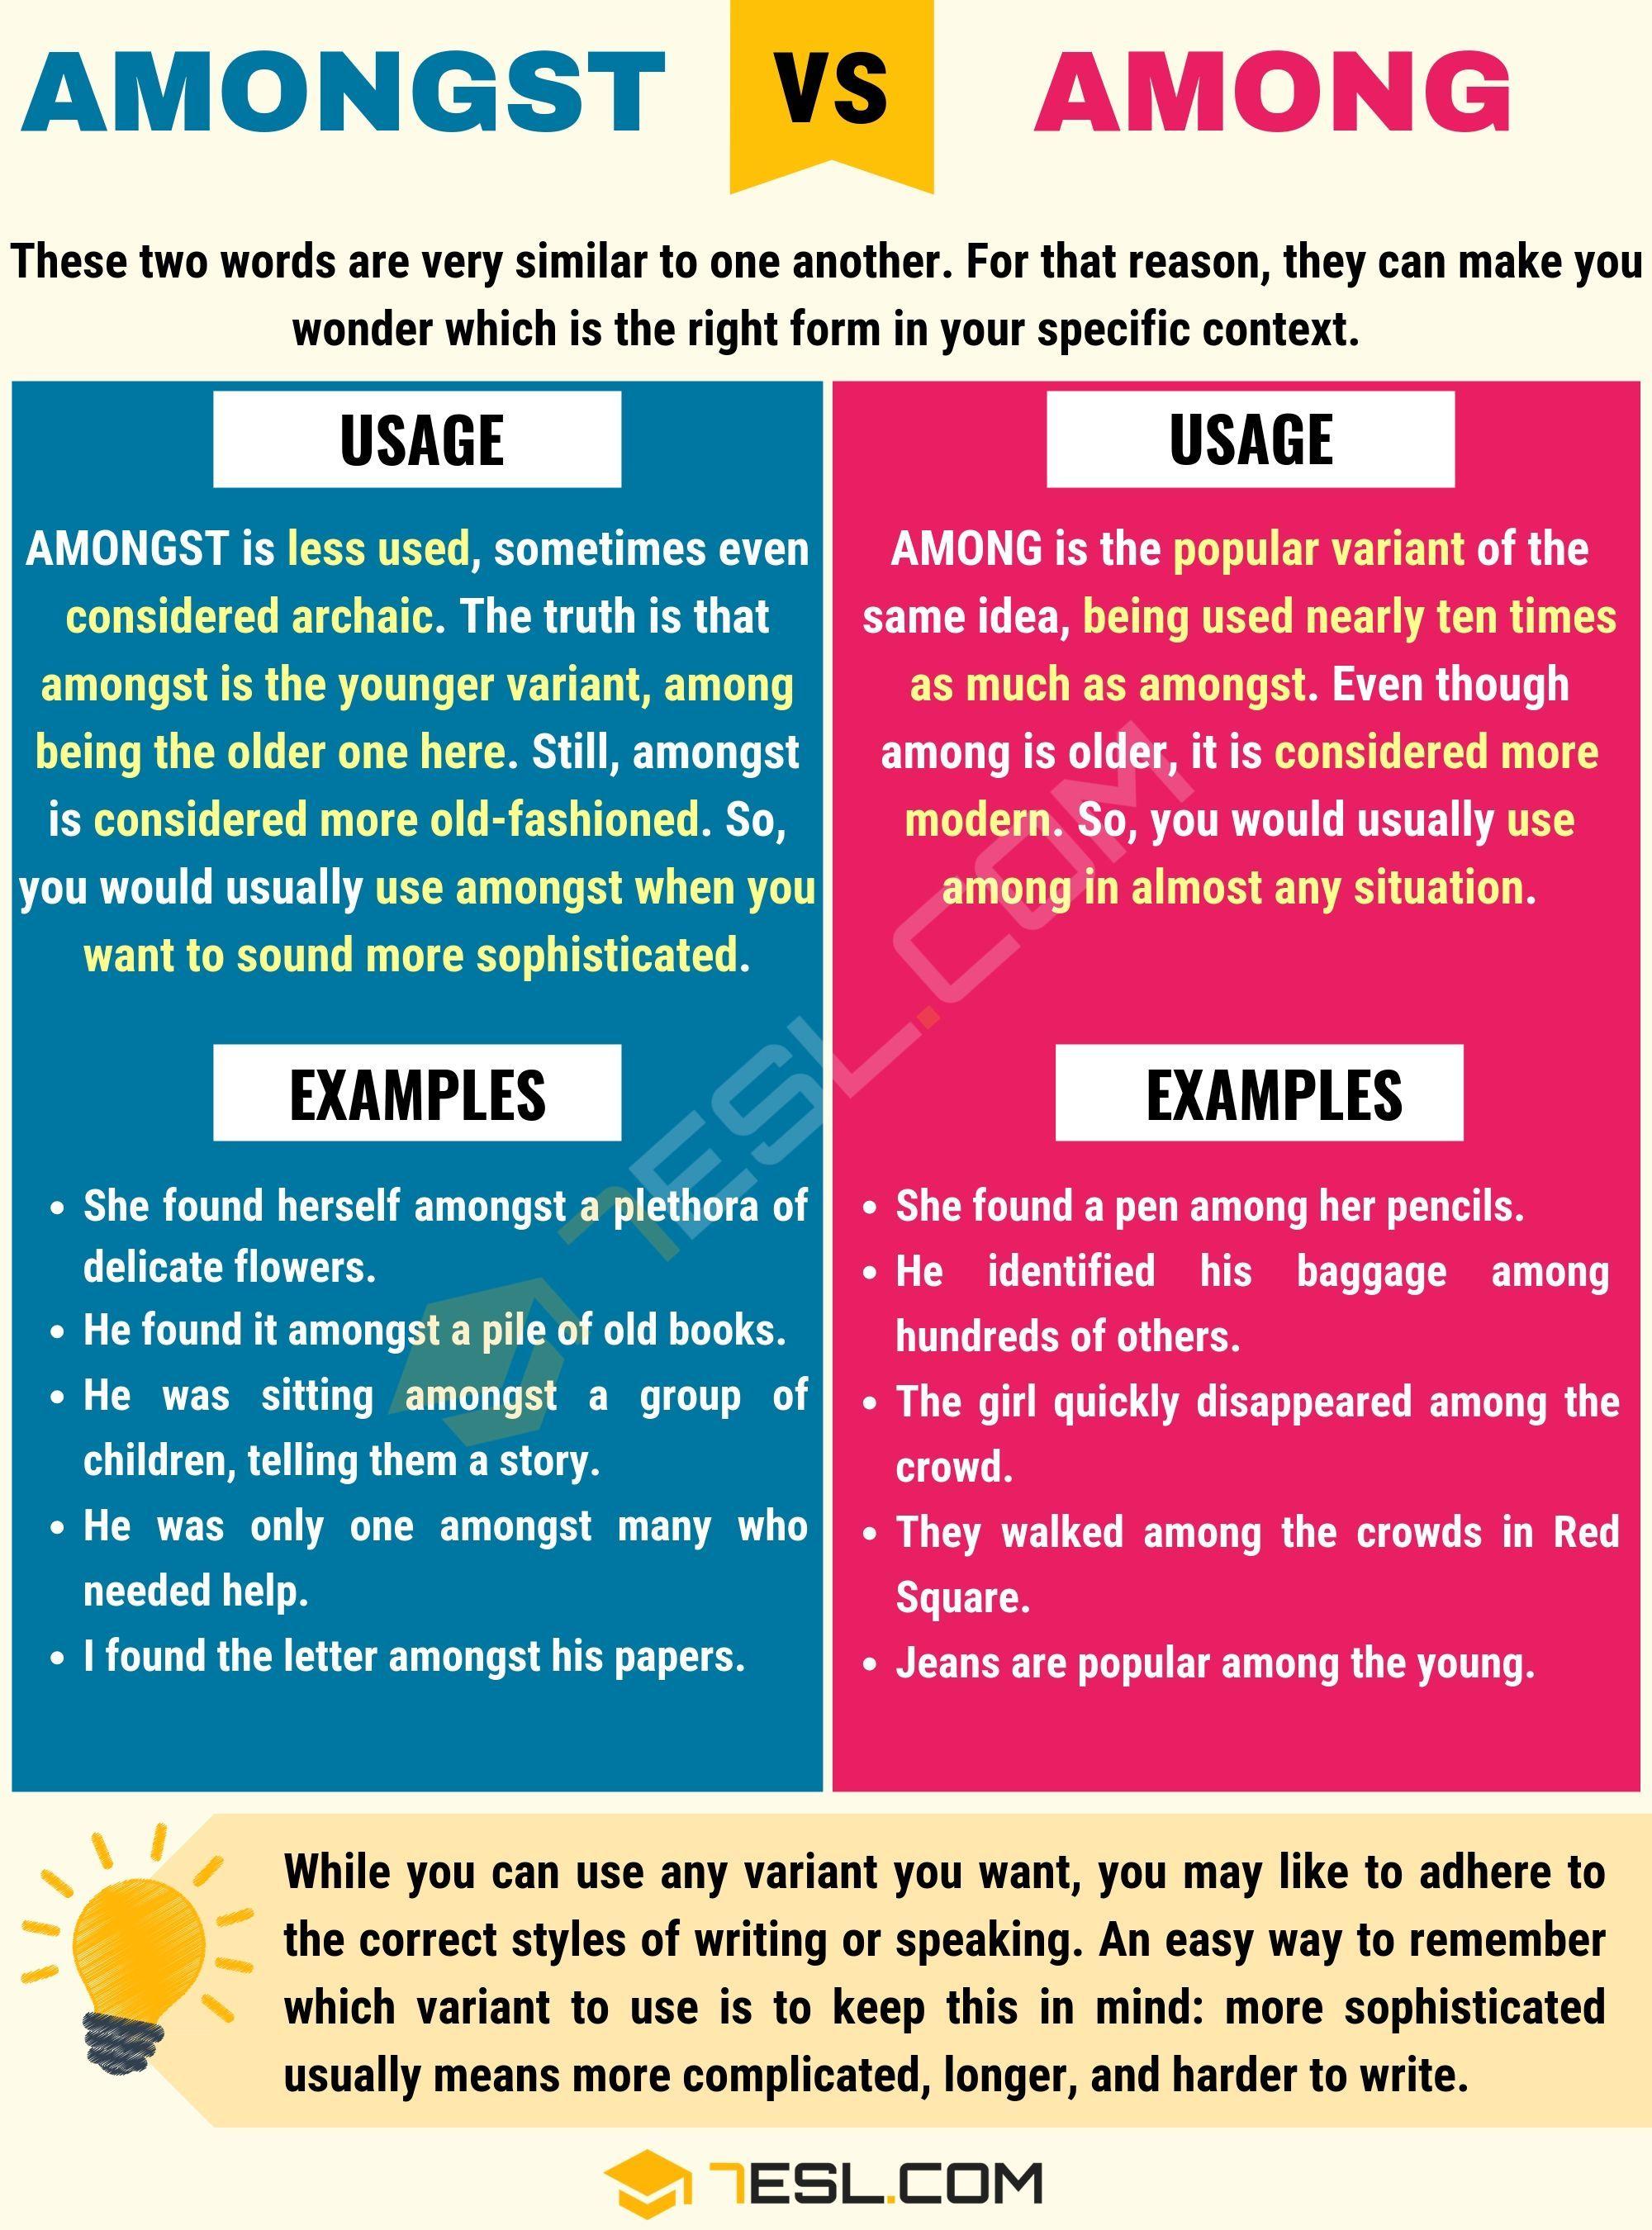 Among Vs Amongst How To Use Amongst Vs Among Correctly